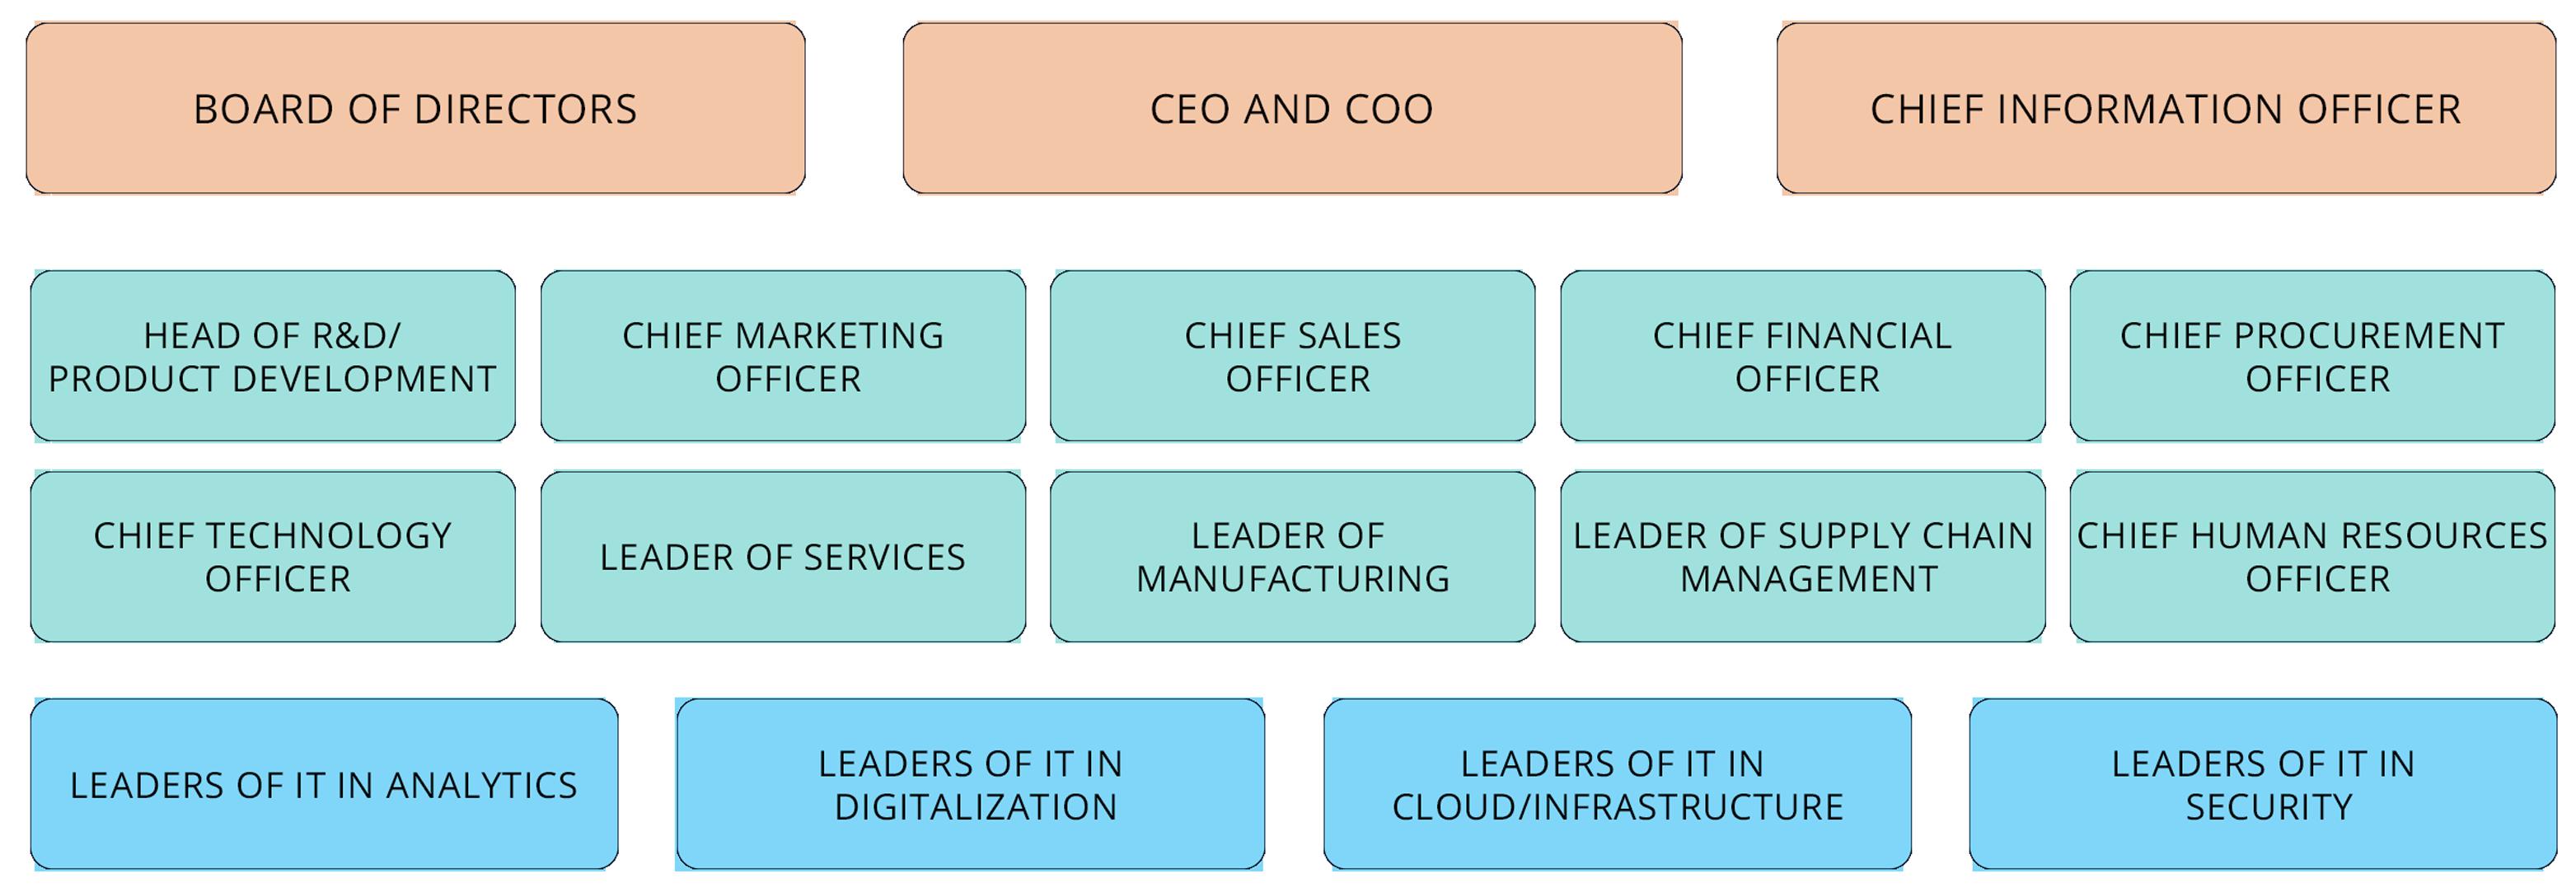 industries-image